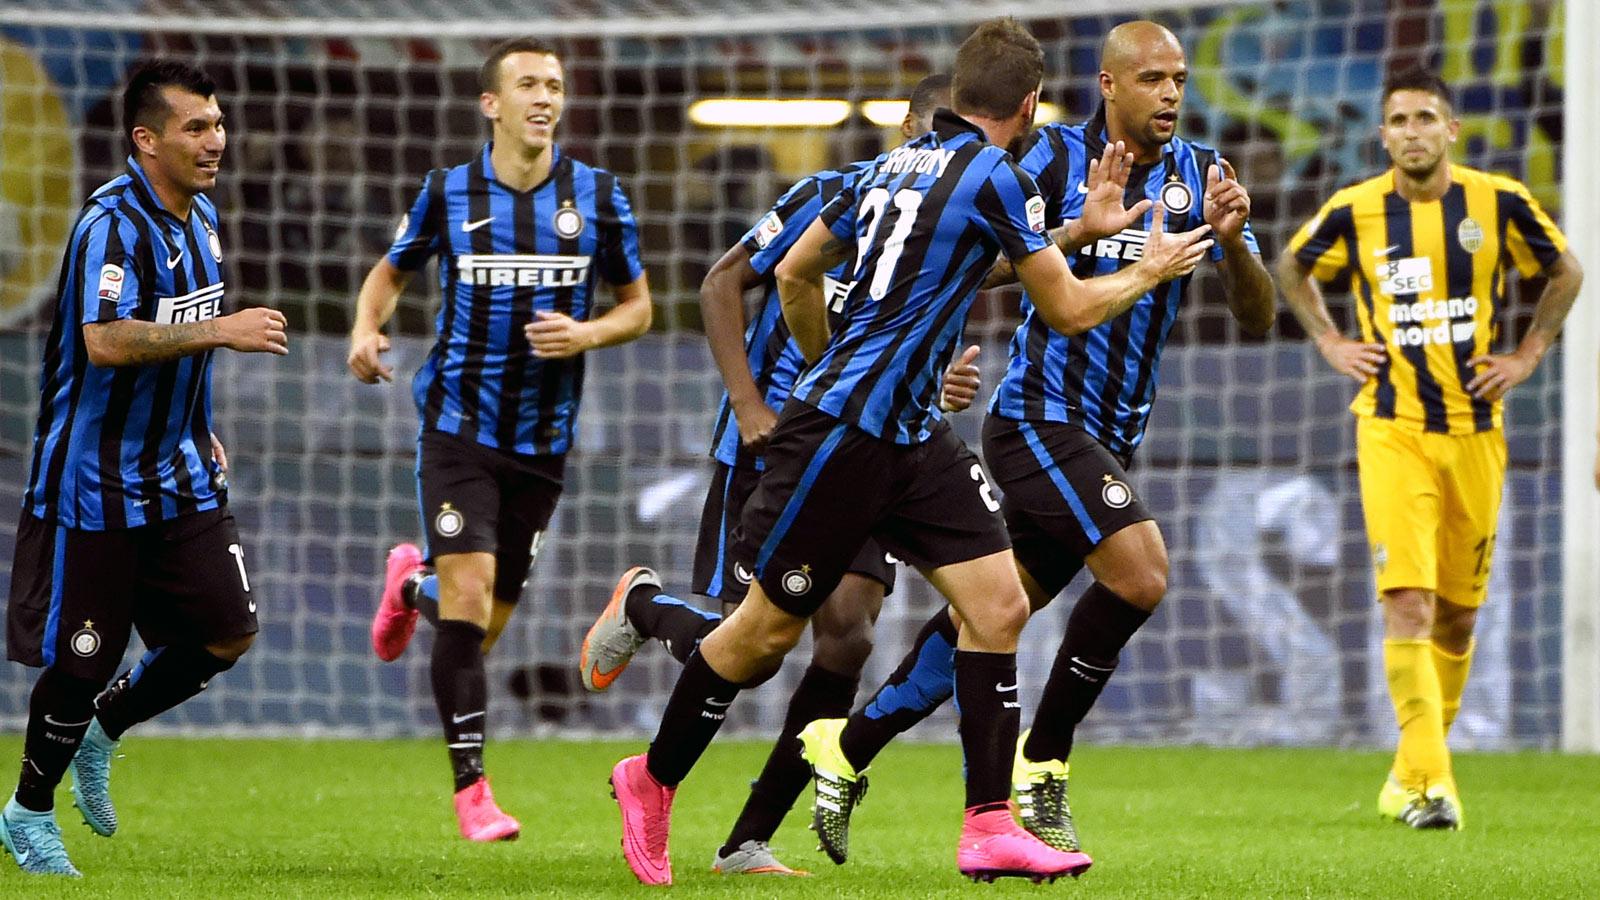 Serie A leader Inter defeat Verona; Juventus, Frosinone draw